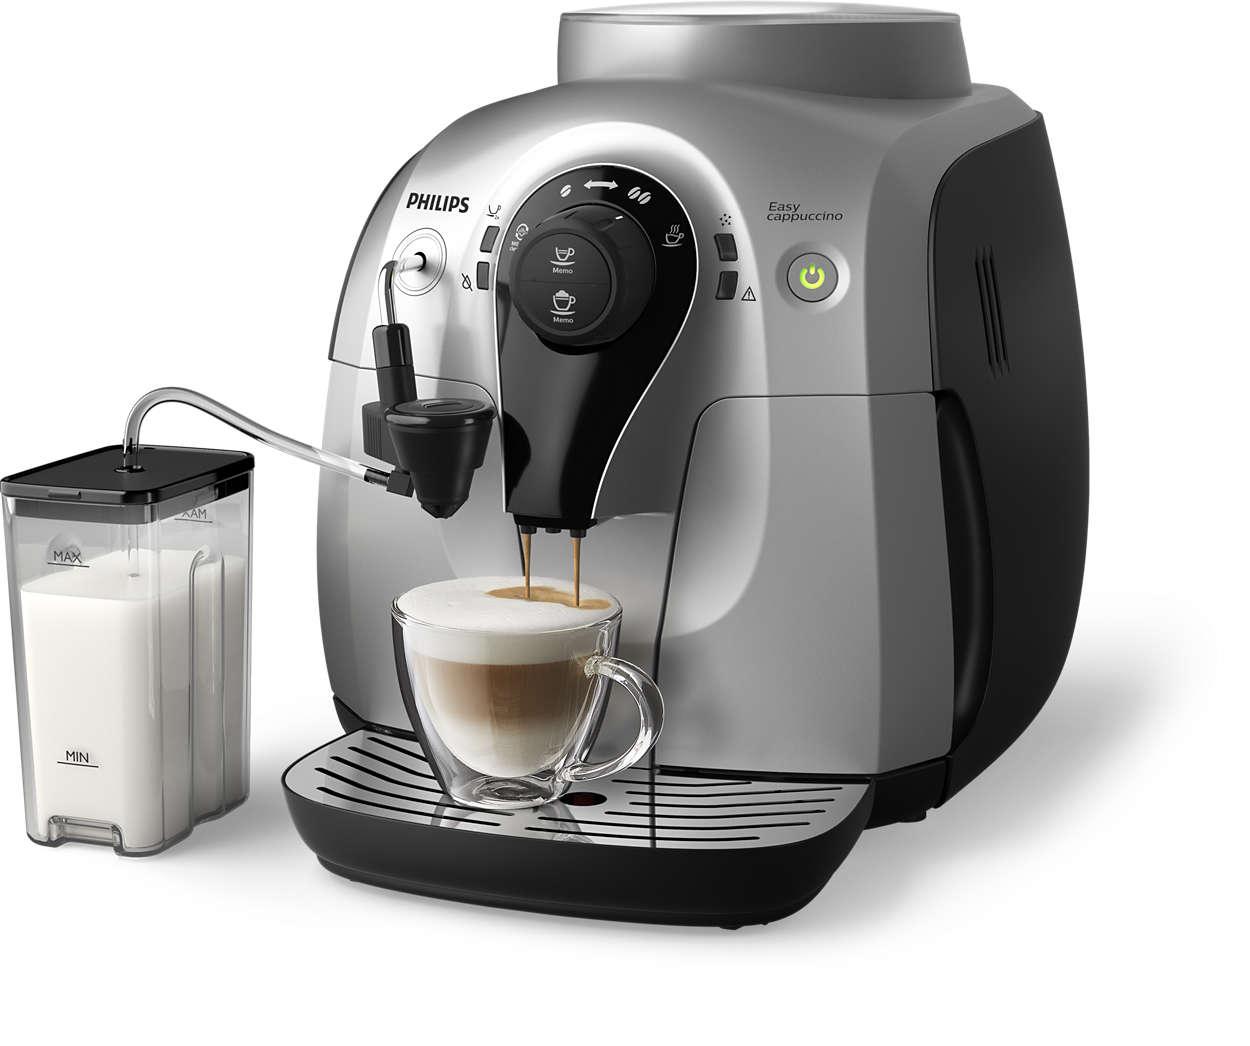 Deilig cappuccino, liten maskin